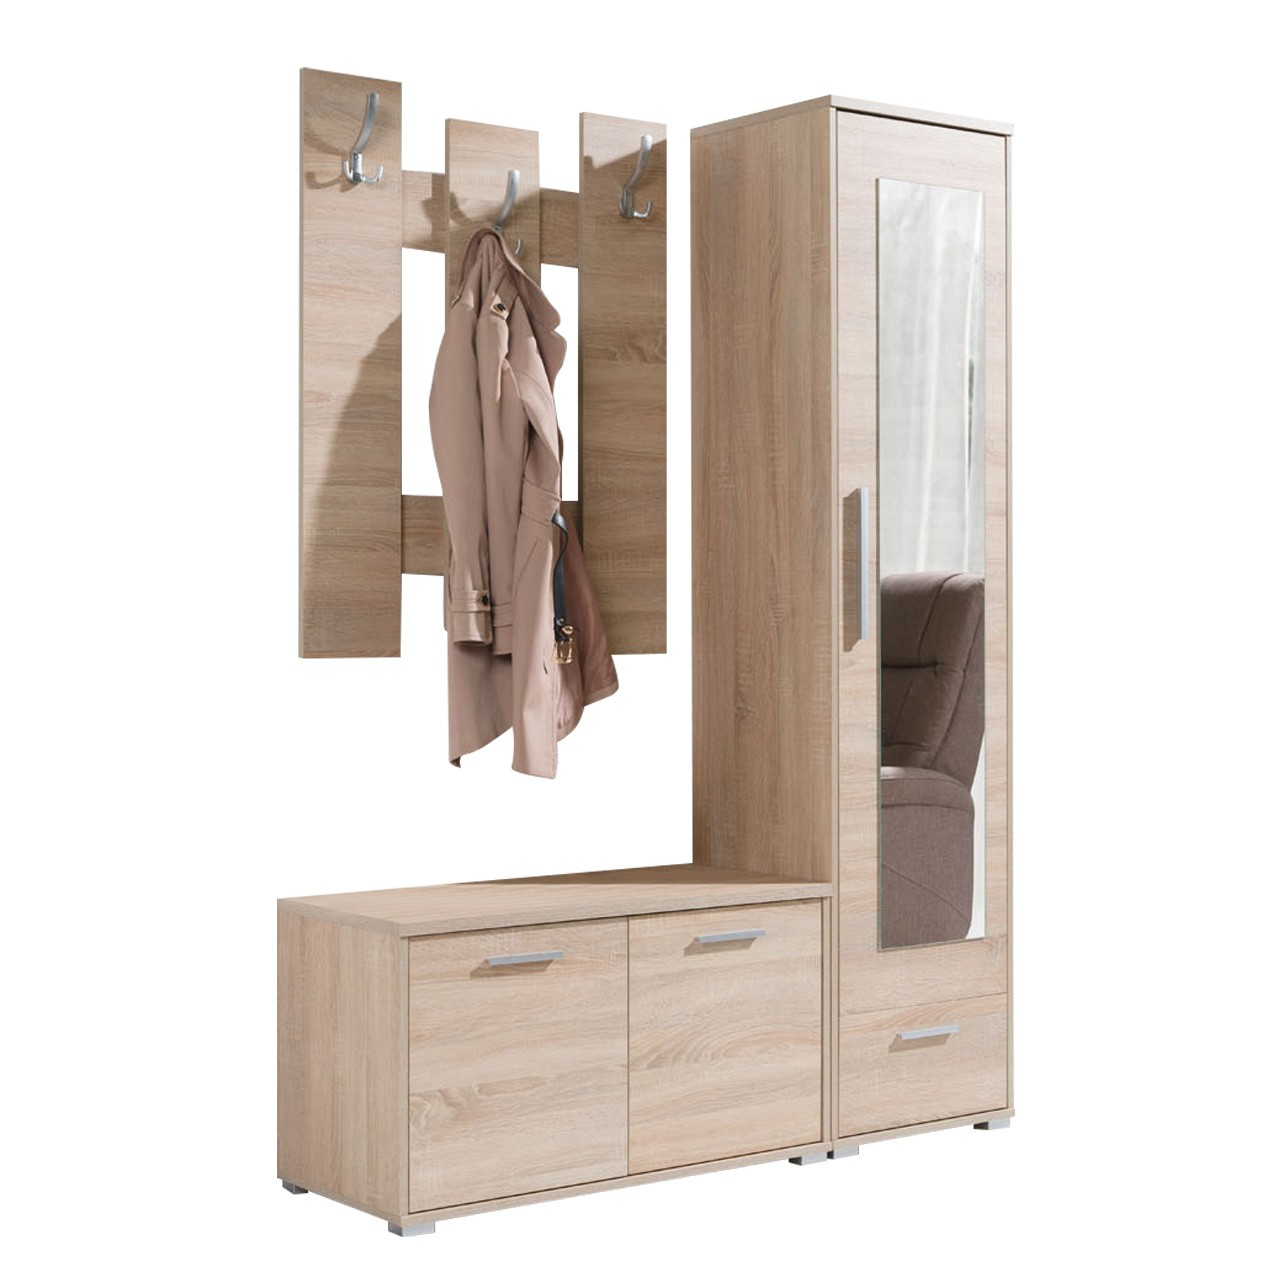 Bezaubernd Garderobe Das Beste Von Garderobe-set Blina; Garderobe-set Blina